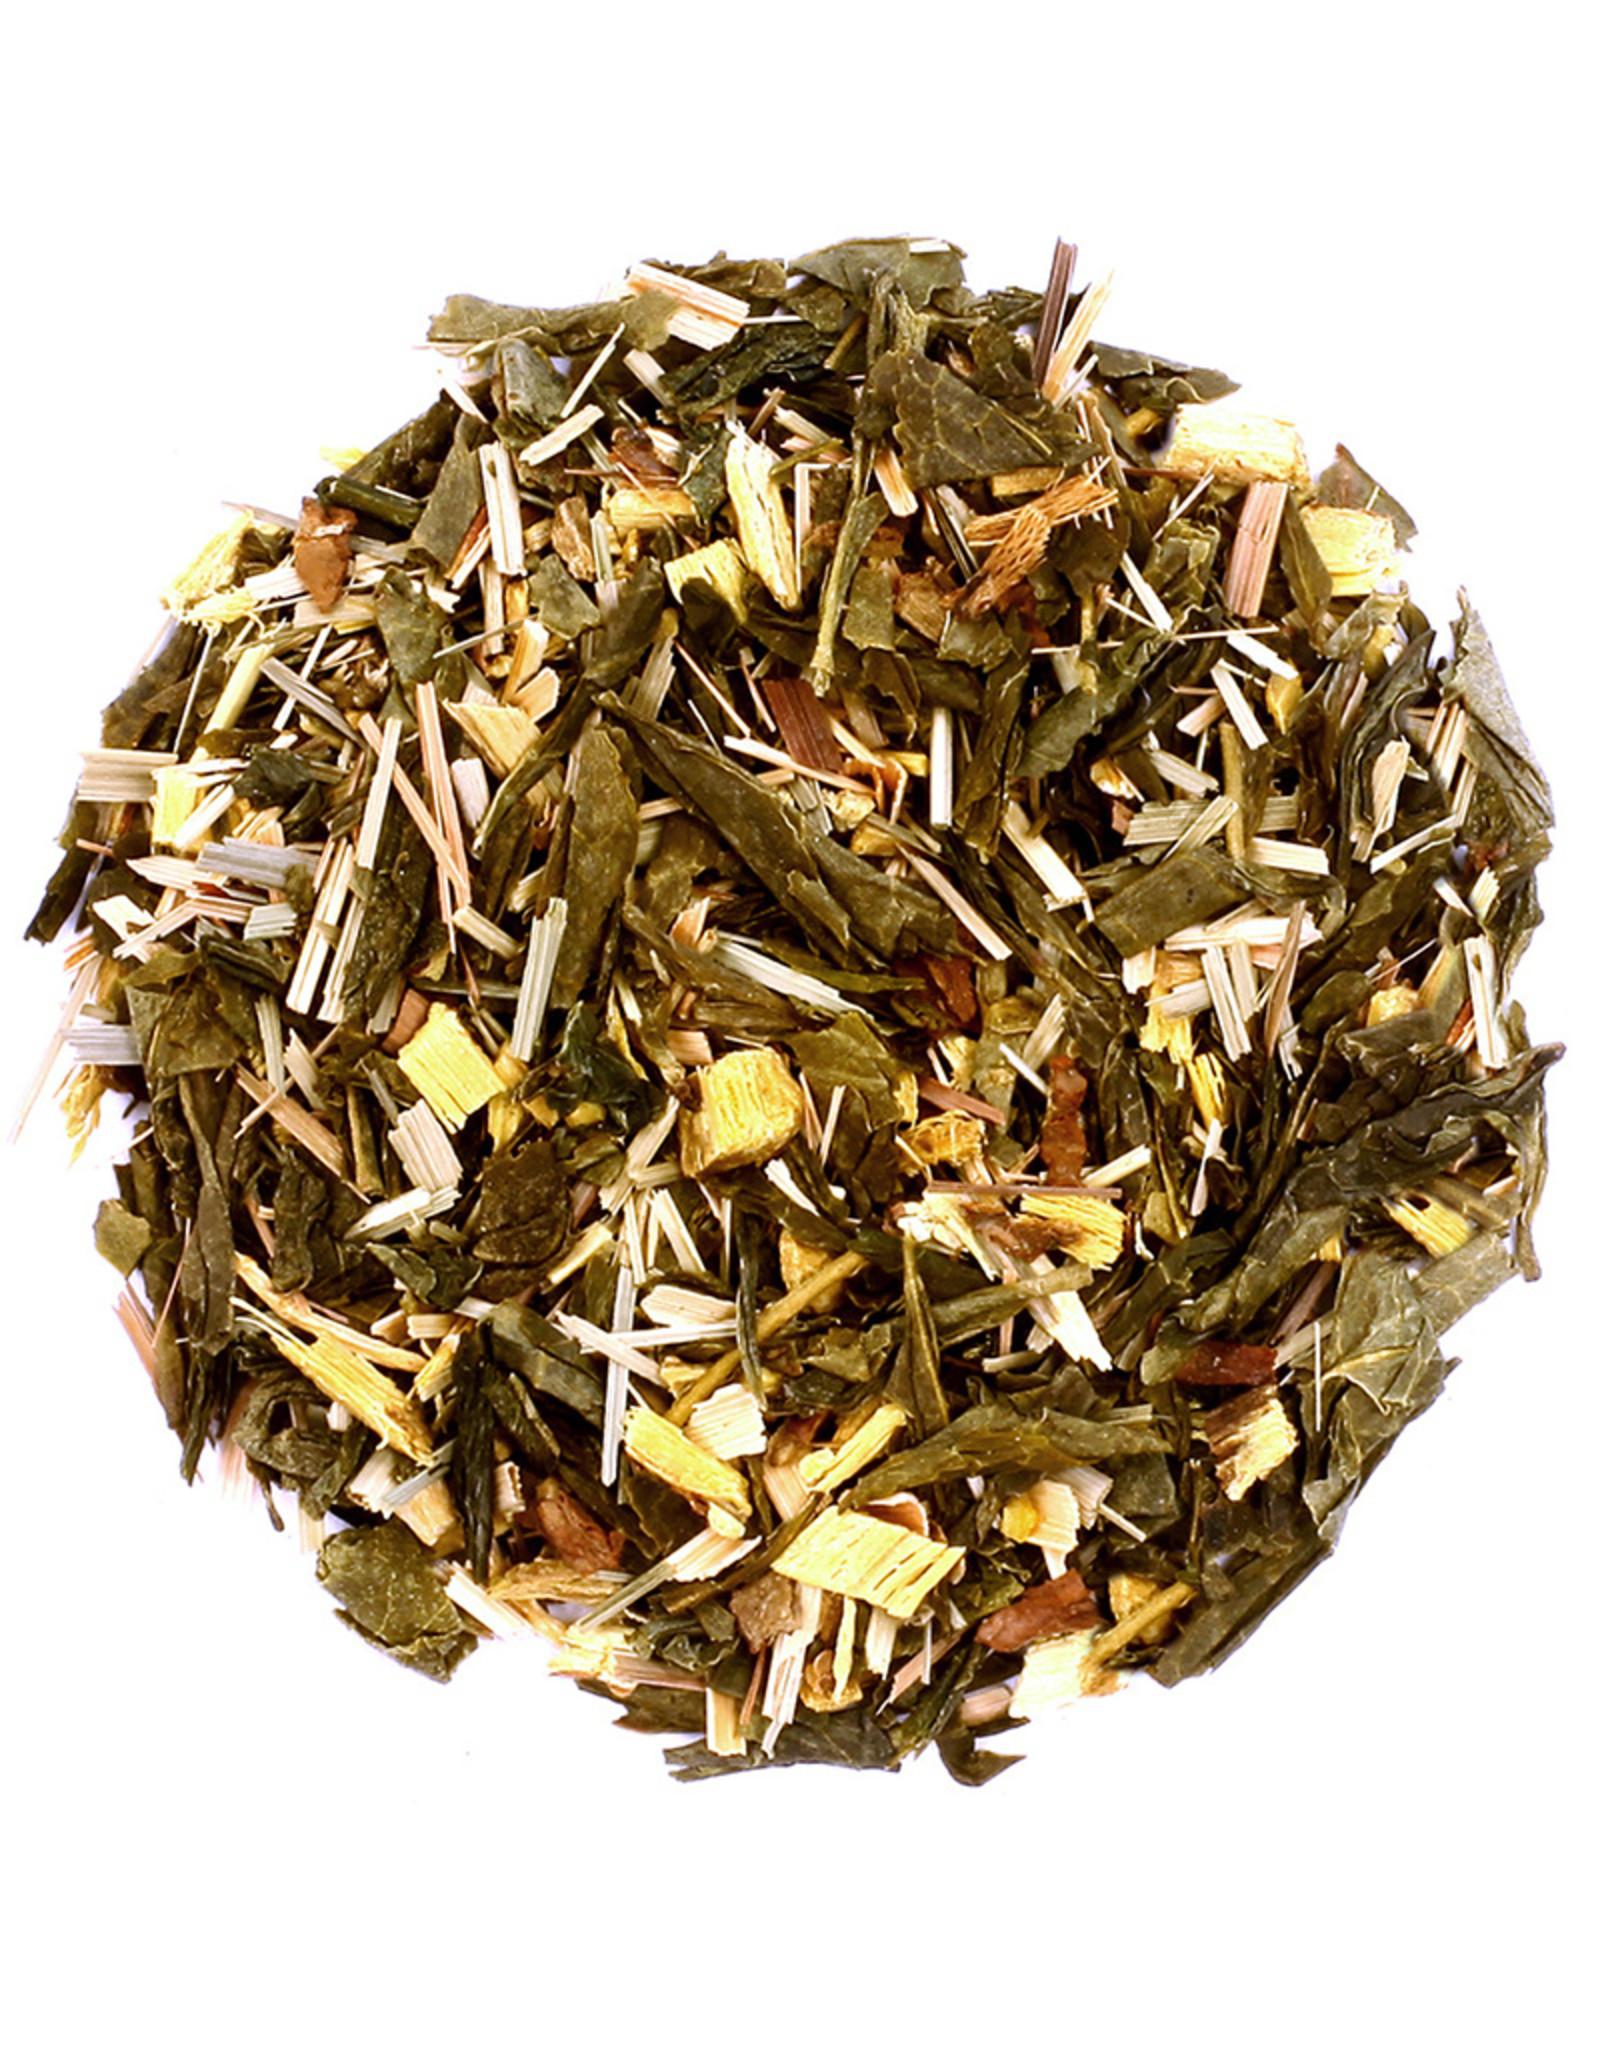 Or Tea? Ginseng Beauty BIO - Groene thee met zoethout en ginseng